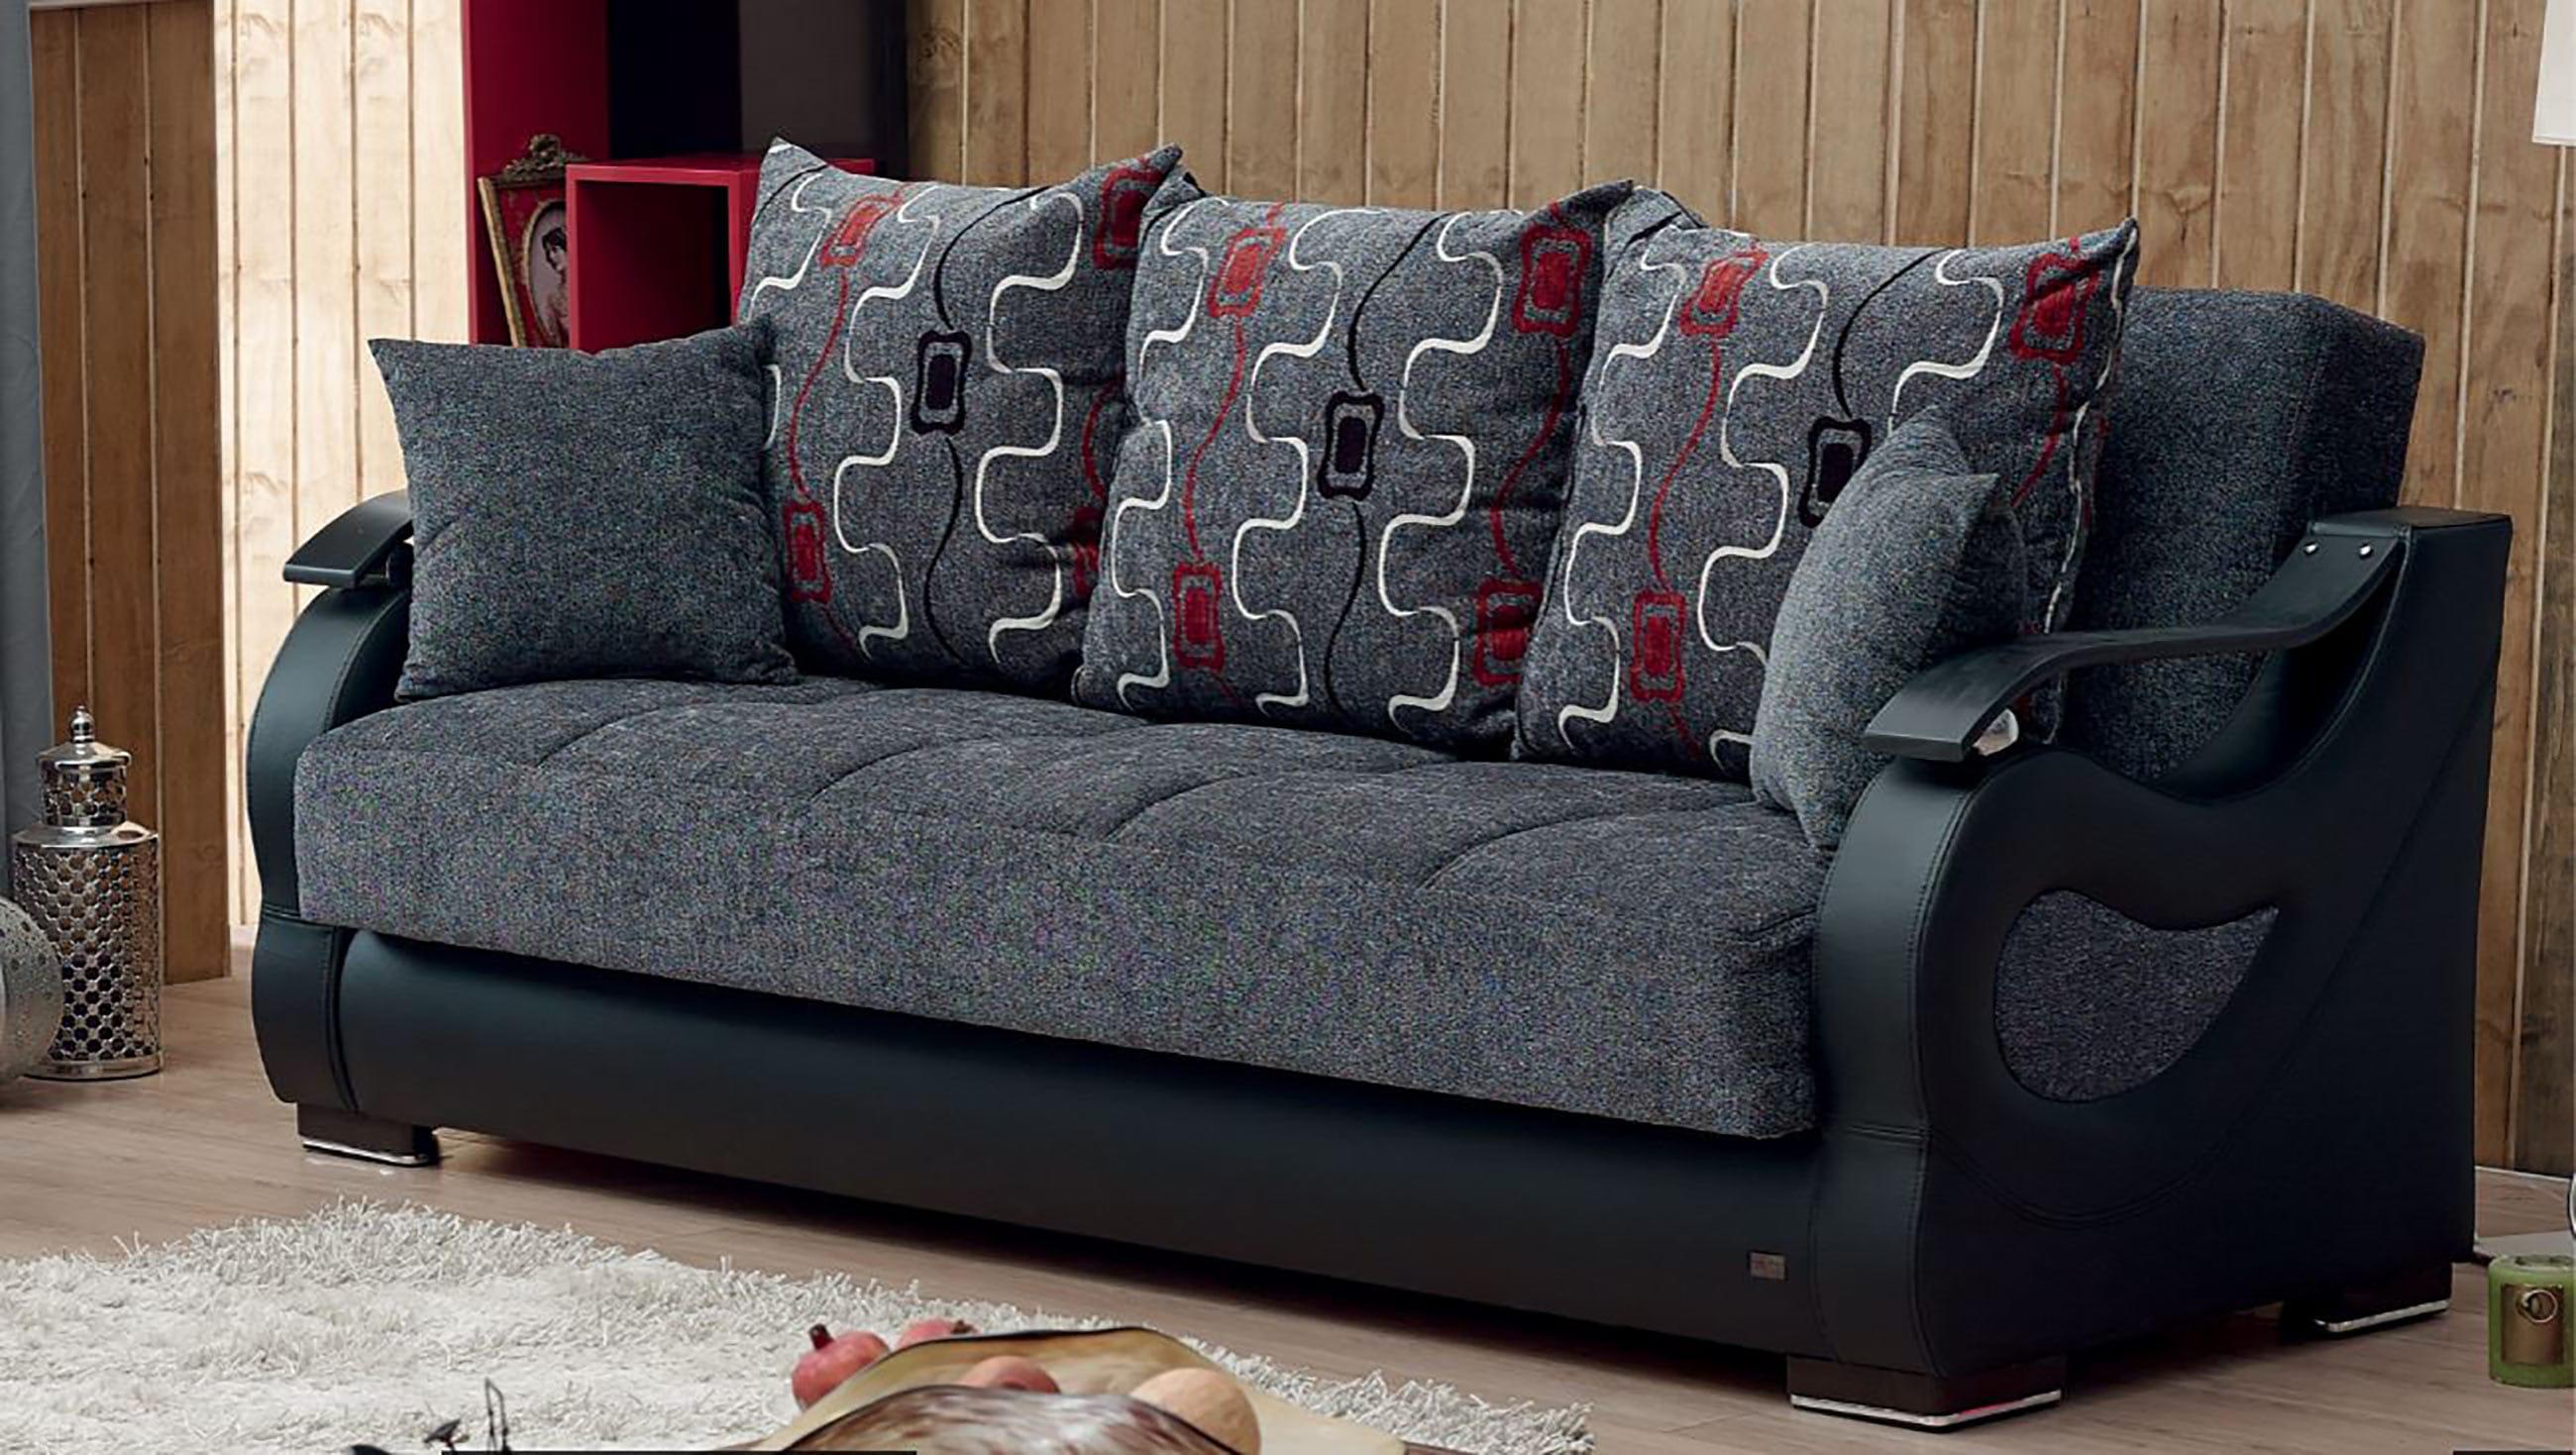 Arizona Gray Fabric Sofa Bed By Empire Furniture Usa